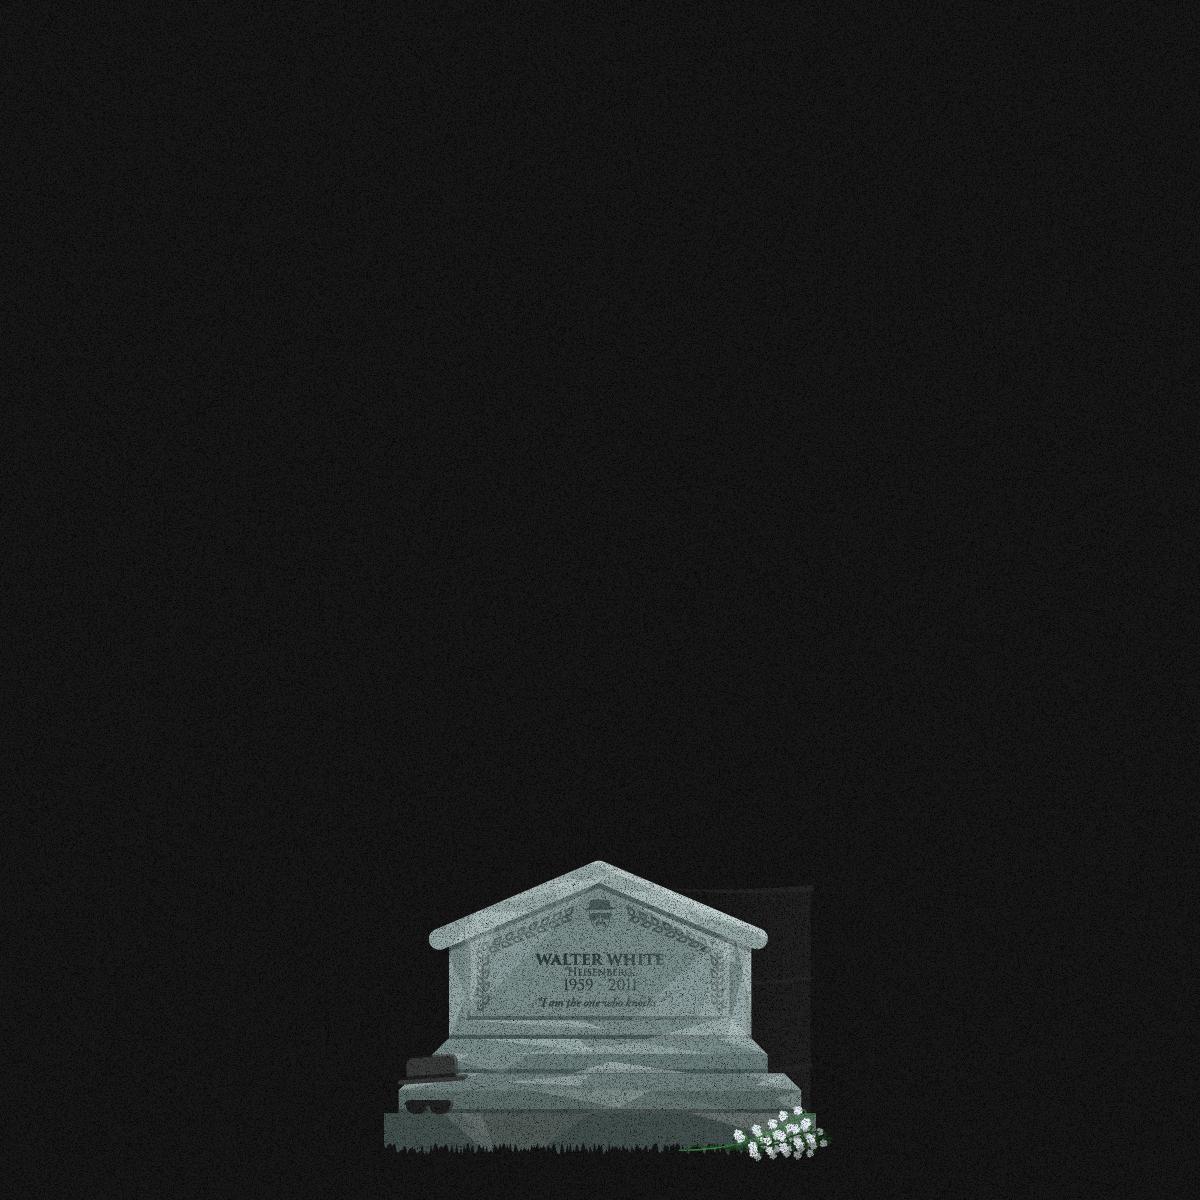 Grave-01